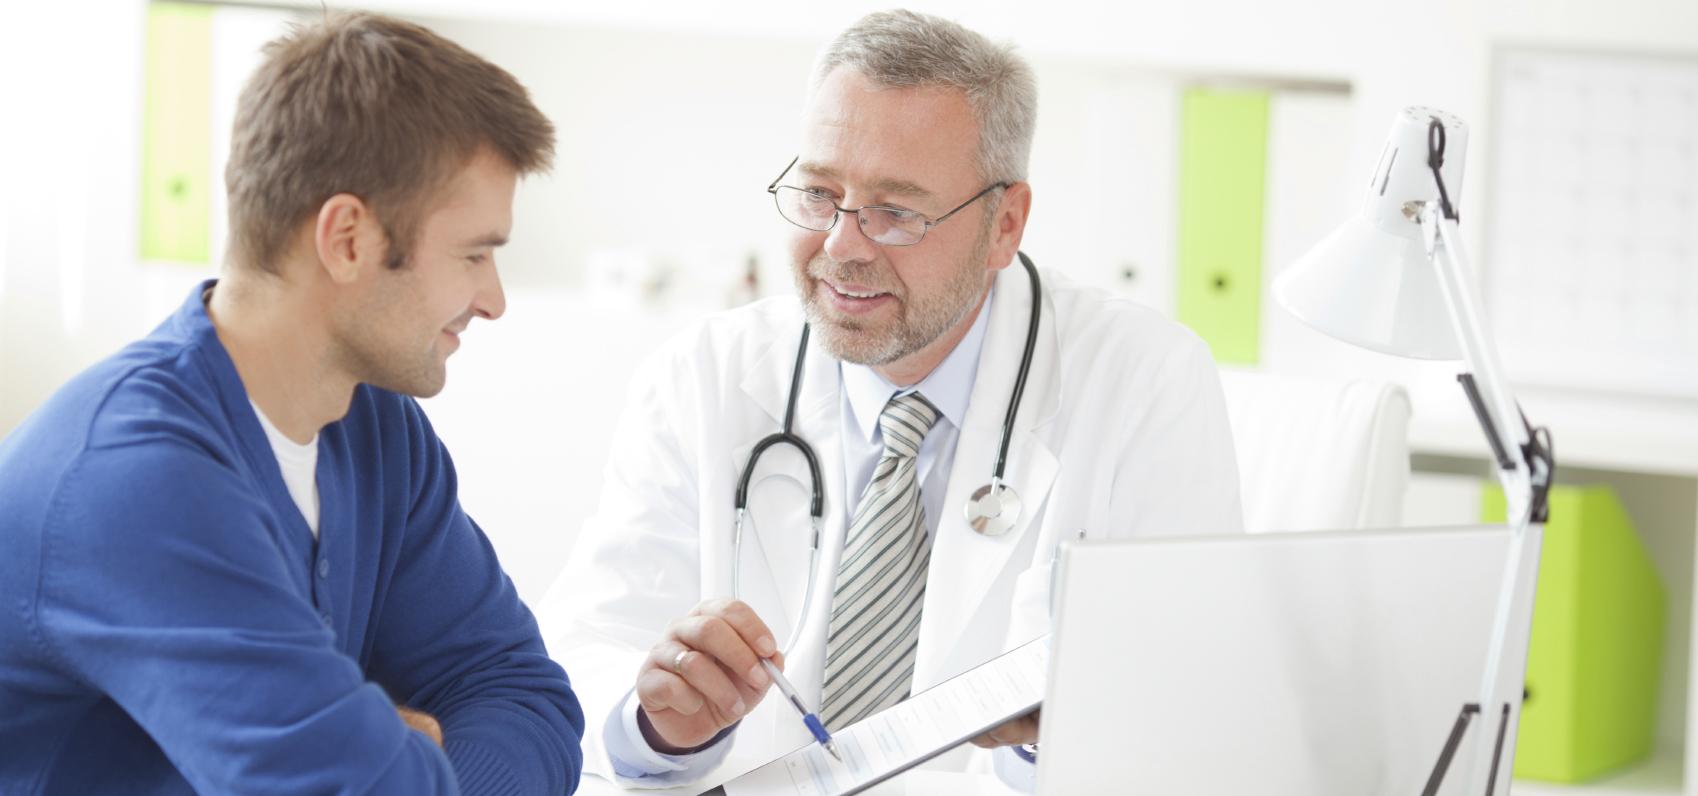 Consulta con urólogo en Barcelona de eyaculación precoz